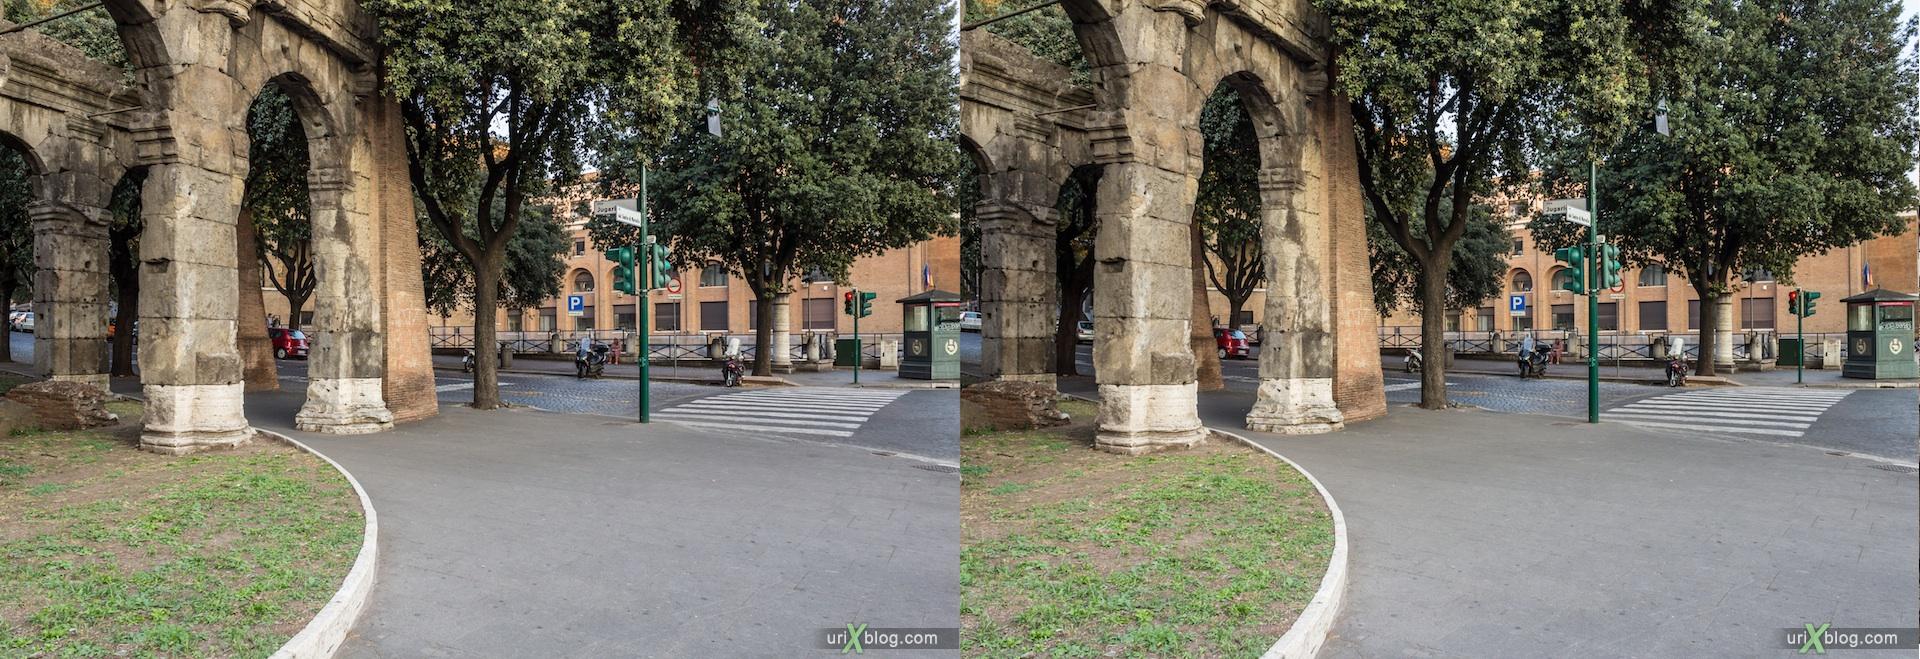 2012, улица Luigi Petroselli, улица Vico Jugario, Рим, Италия, осень, 3D, перекрёстные стереопары, стерео, стереопара, стереопары